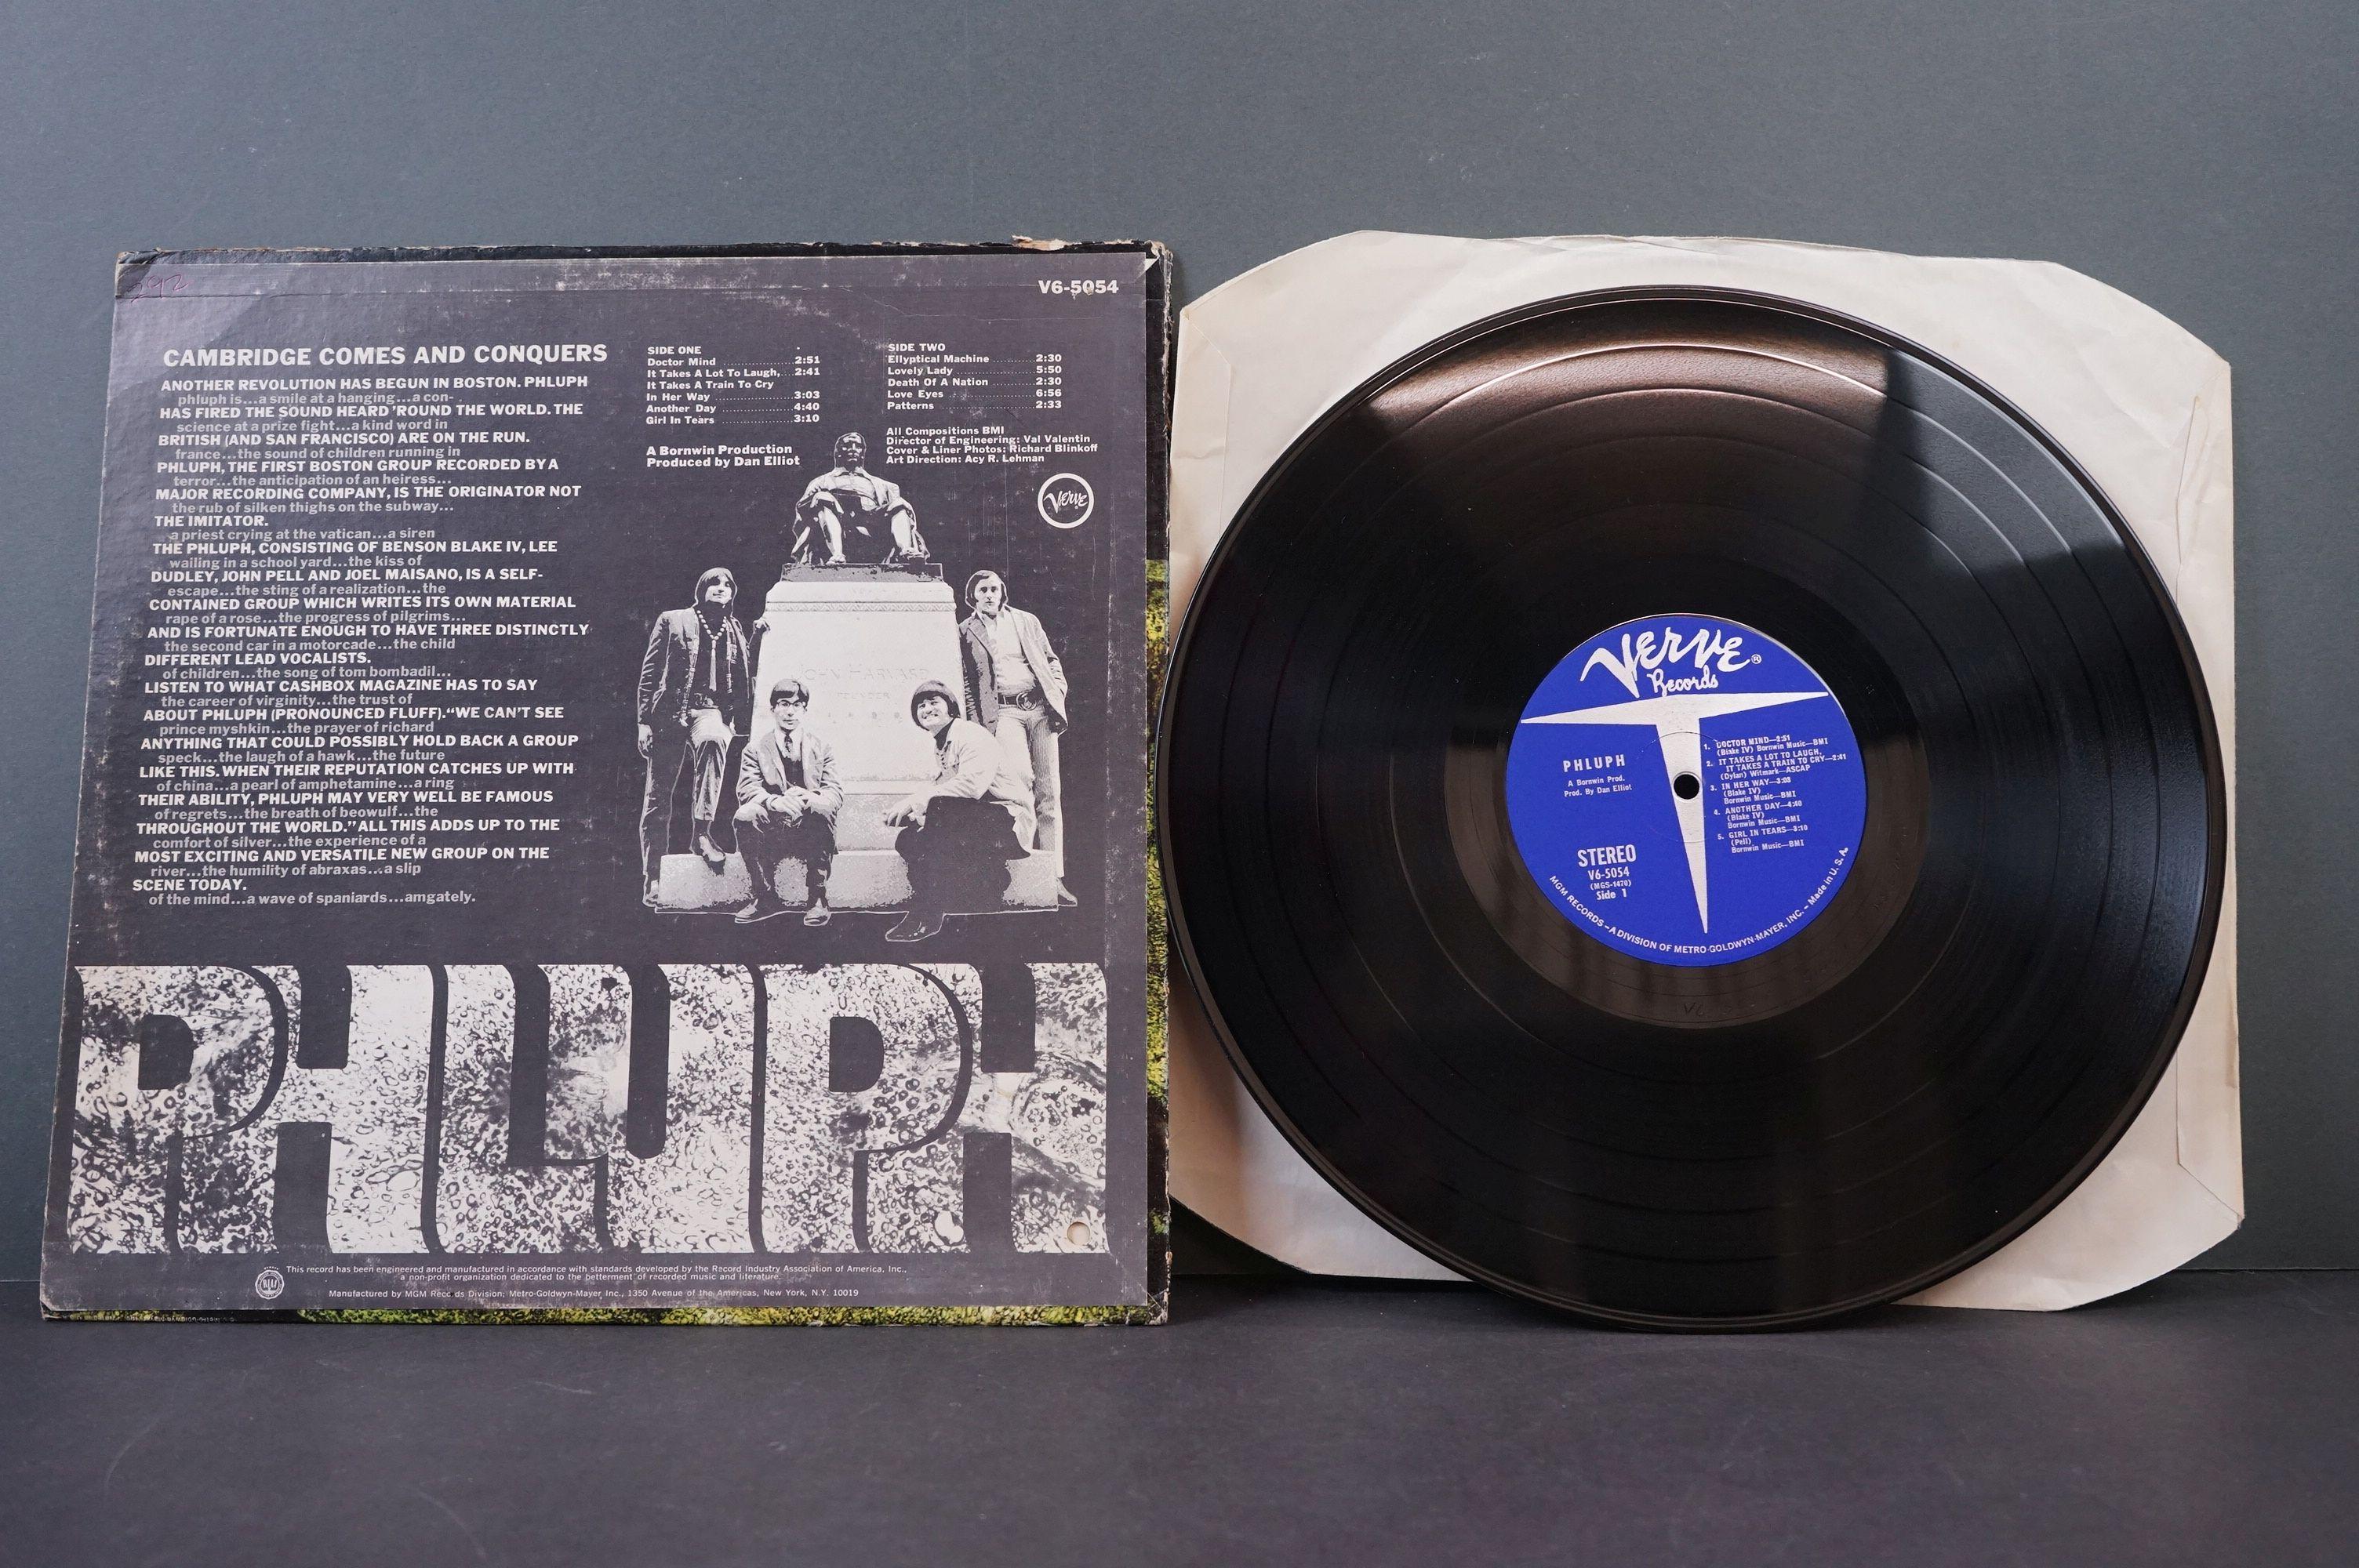 Vinyl - Psych - Three original Rare US pressing Psych albums. Maypole - Maypole (1971 US, Colossus - Image 5 of 8